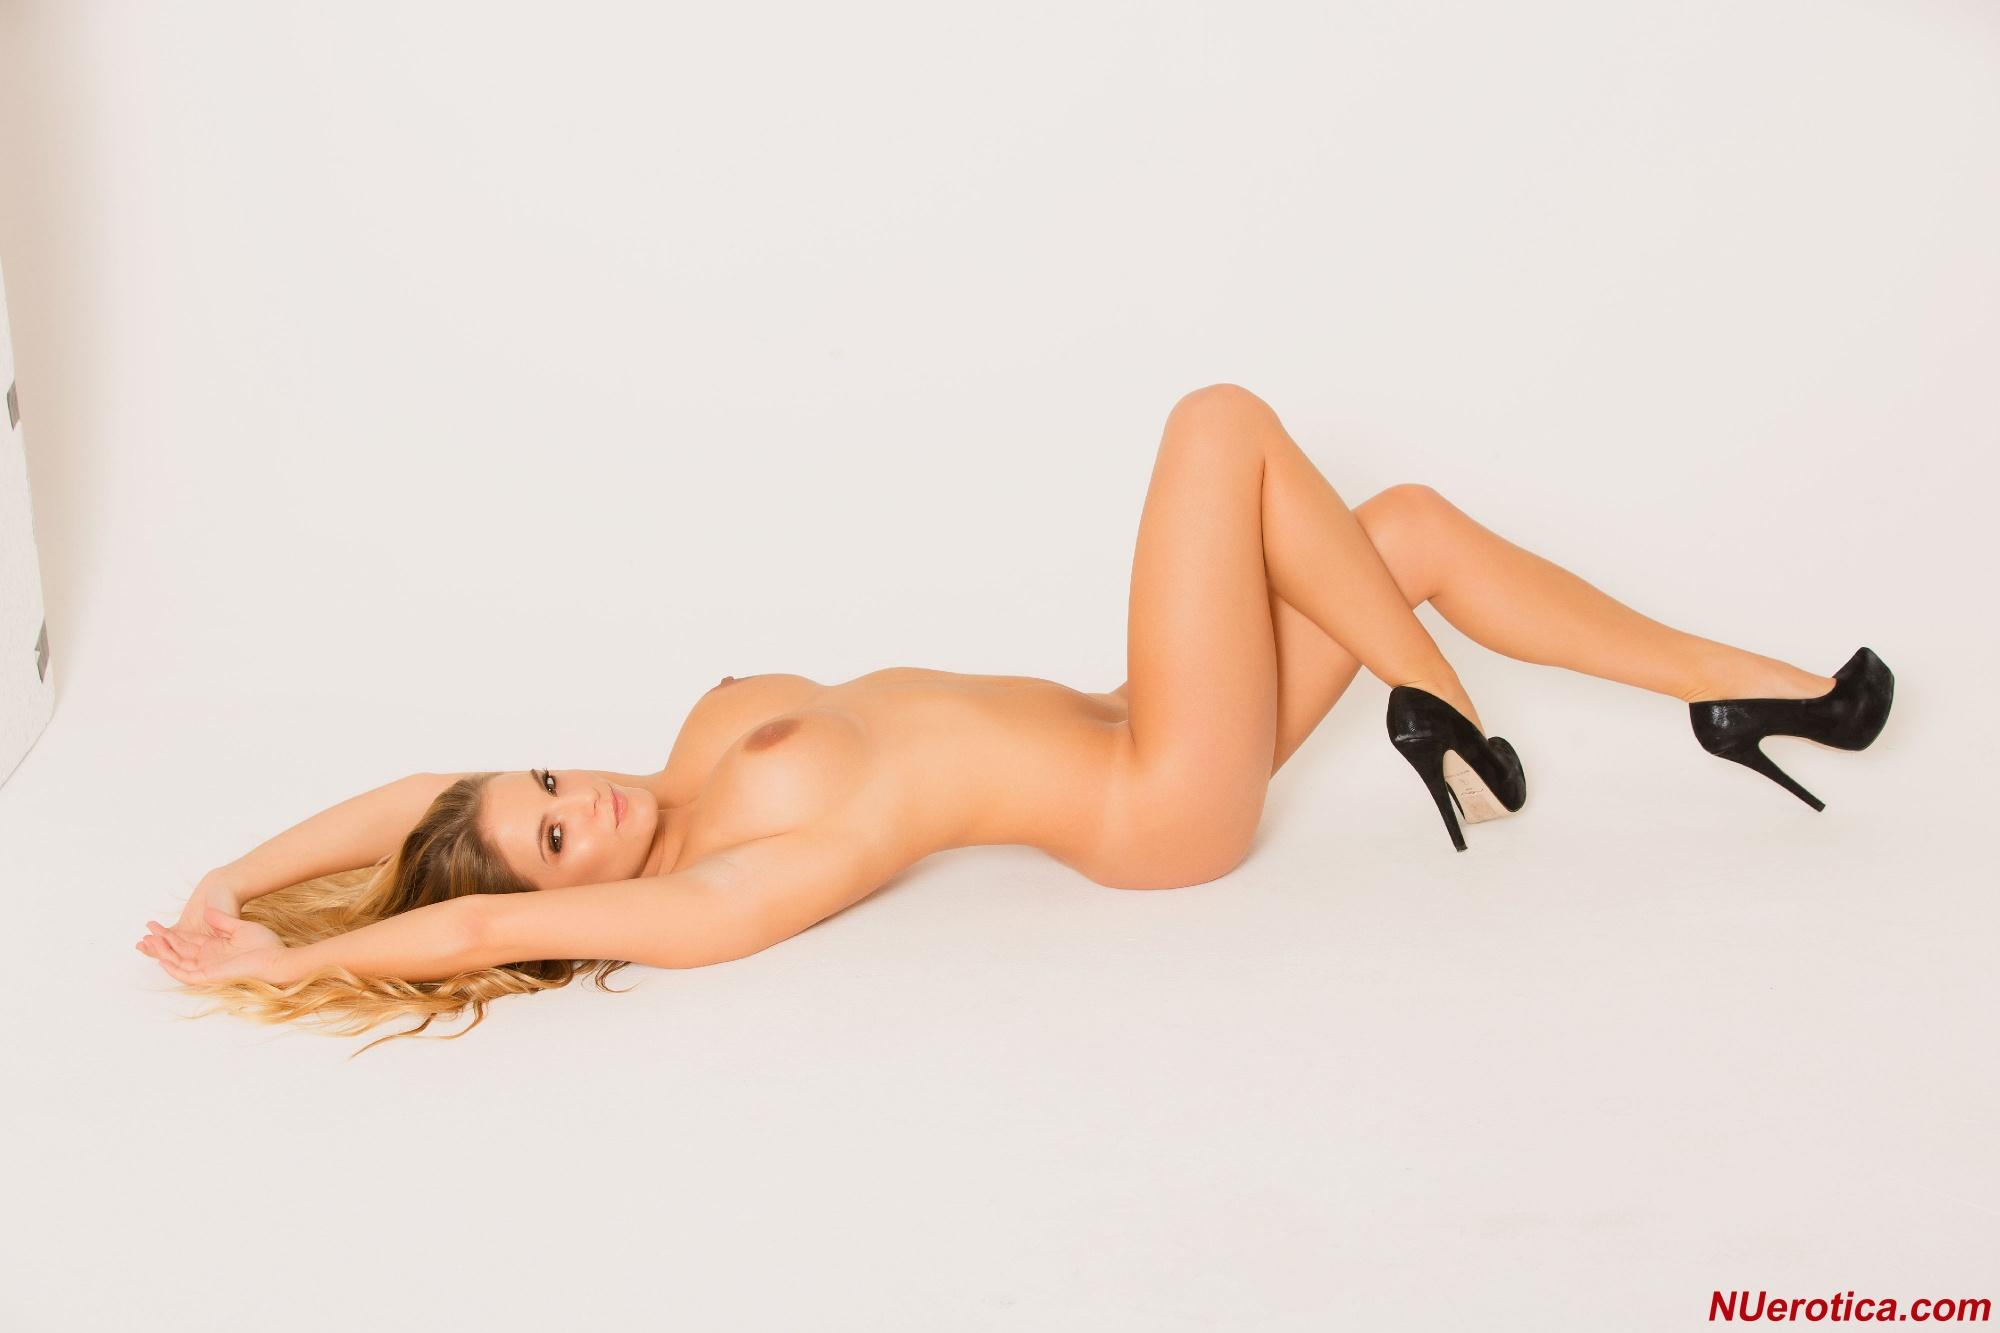 Jessica Kingham, blonde, strip, nude, busty, bikini